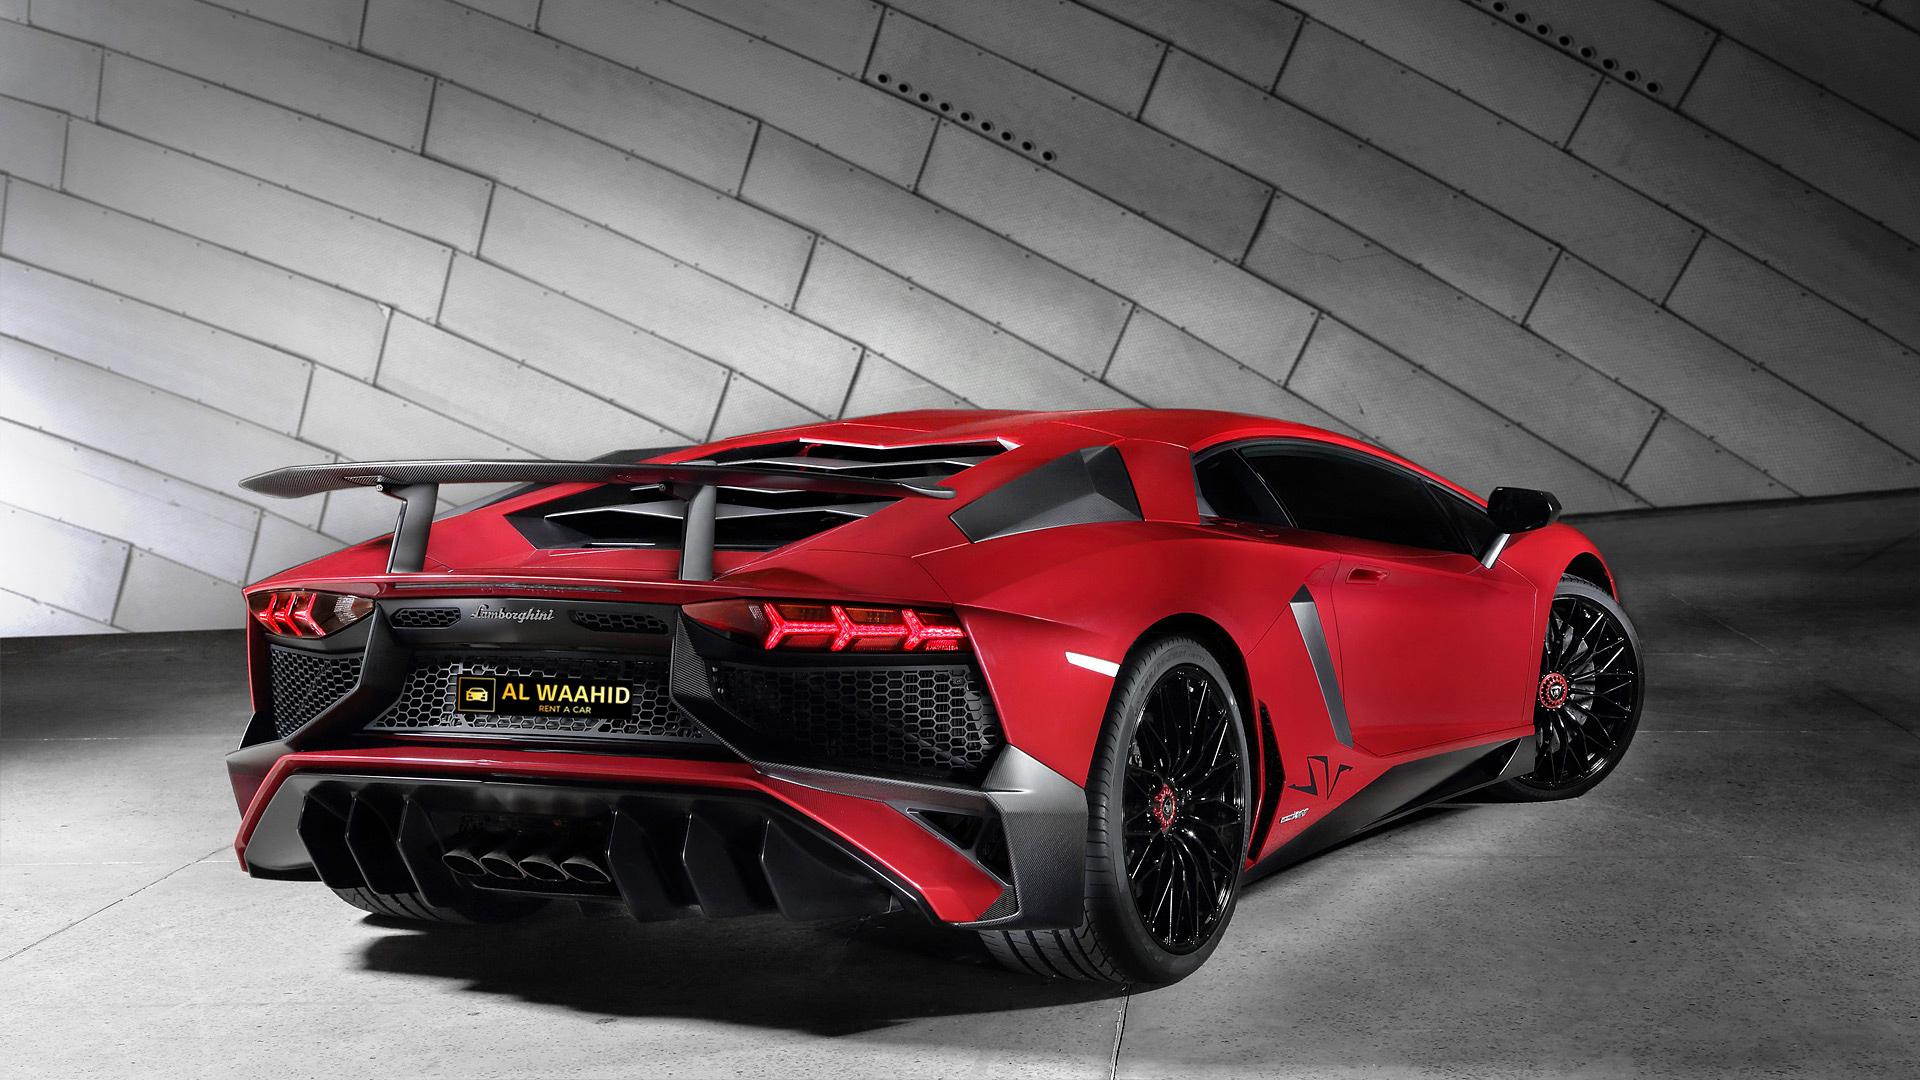 Lamborghini-Aventador-LP750-4-SV – 04